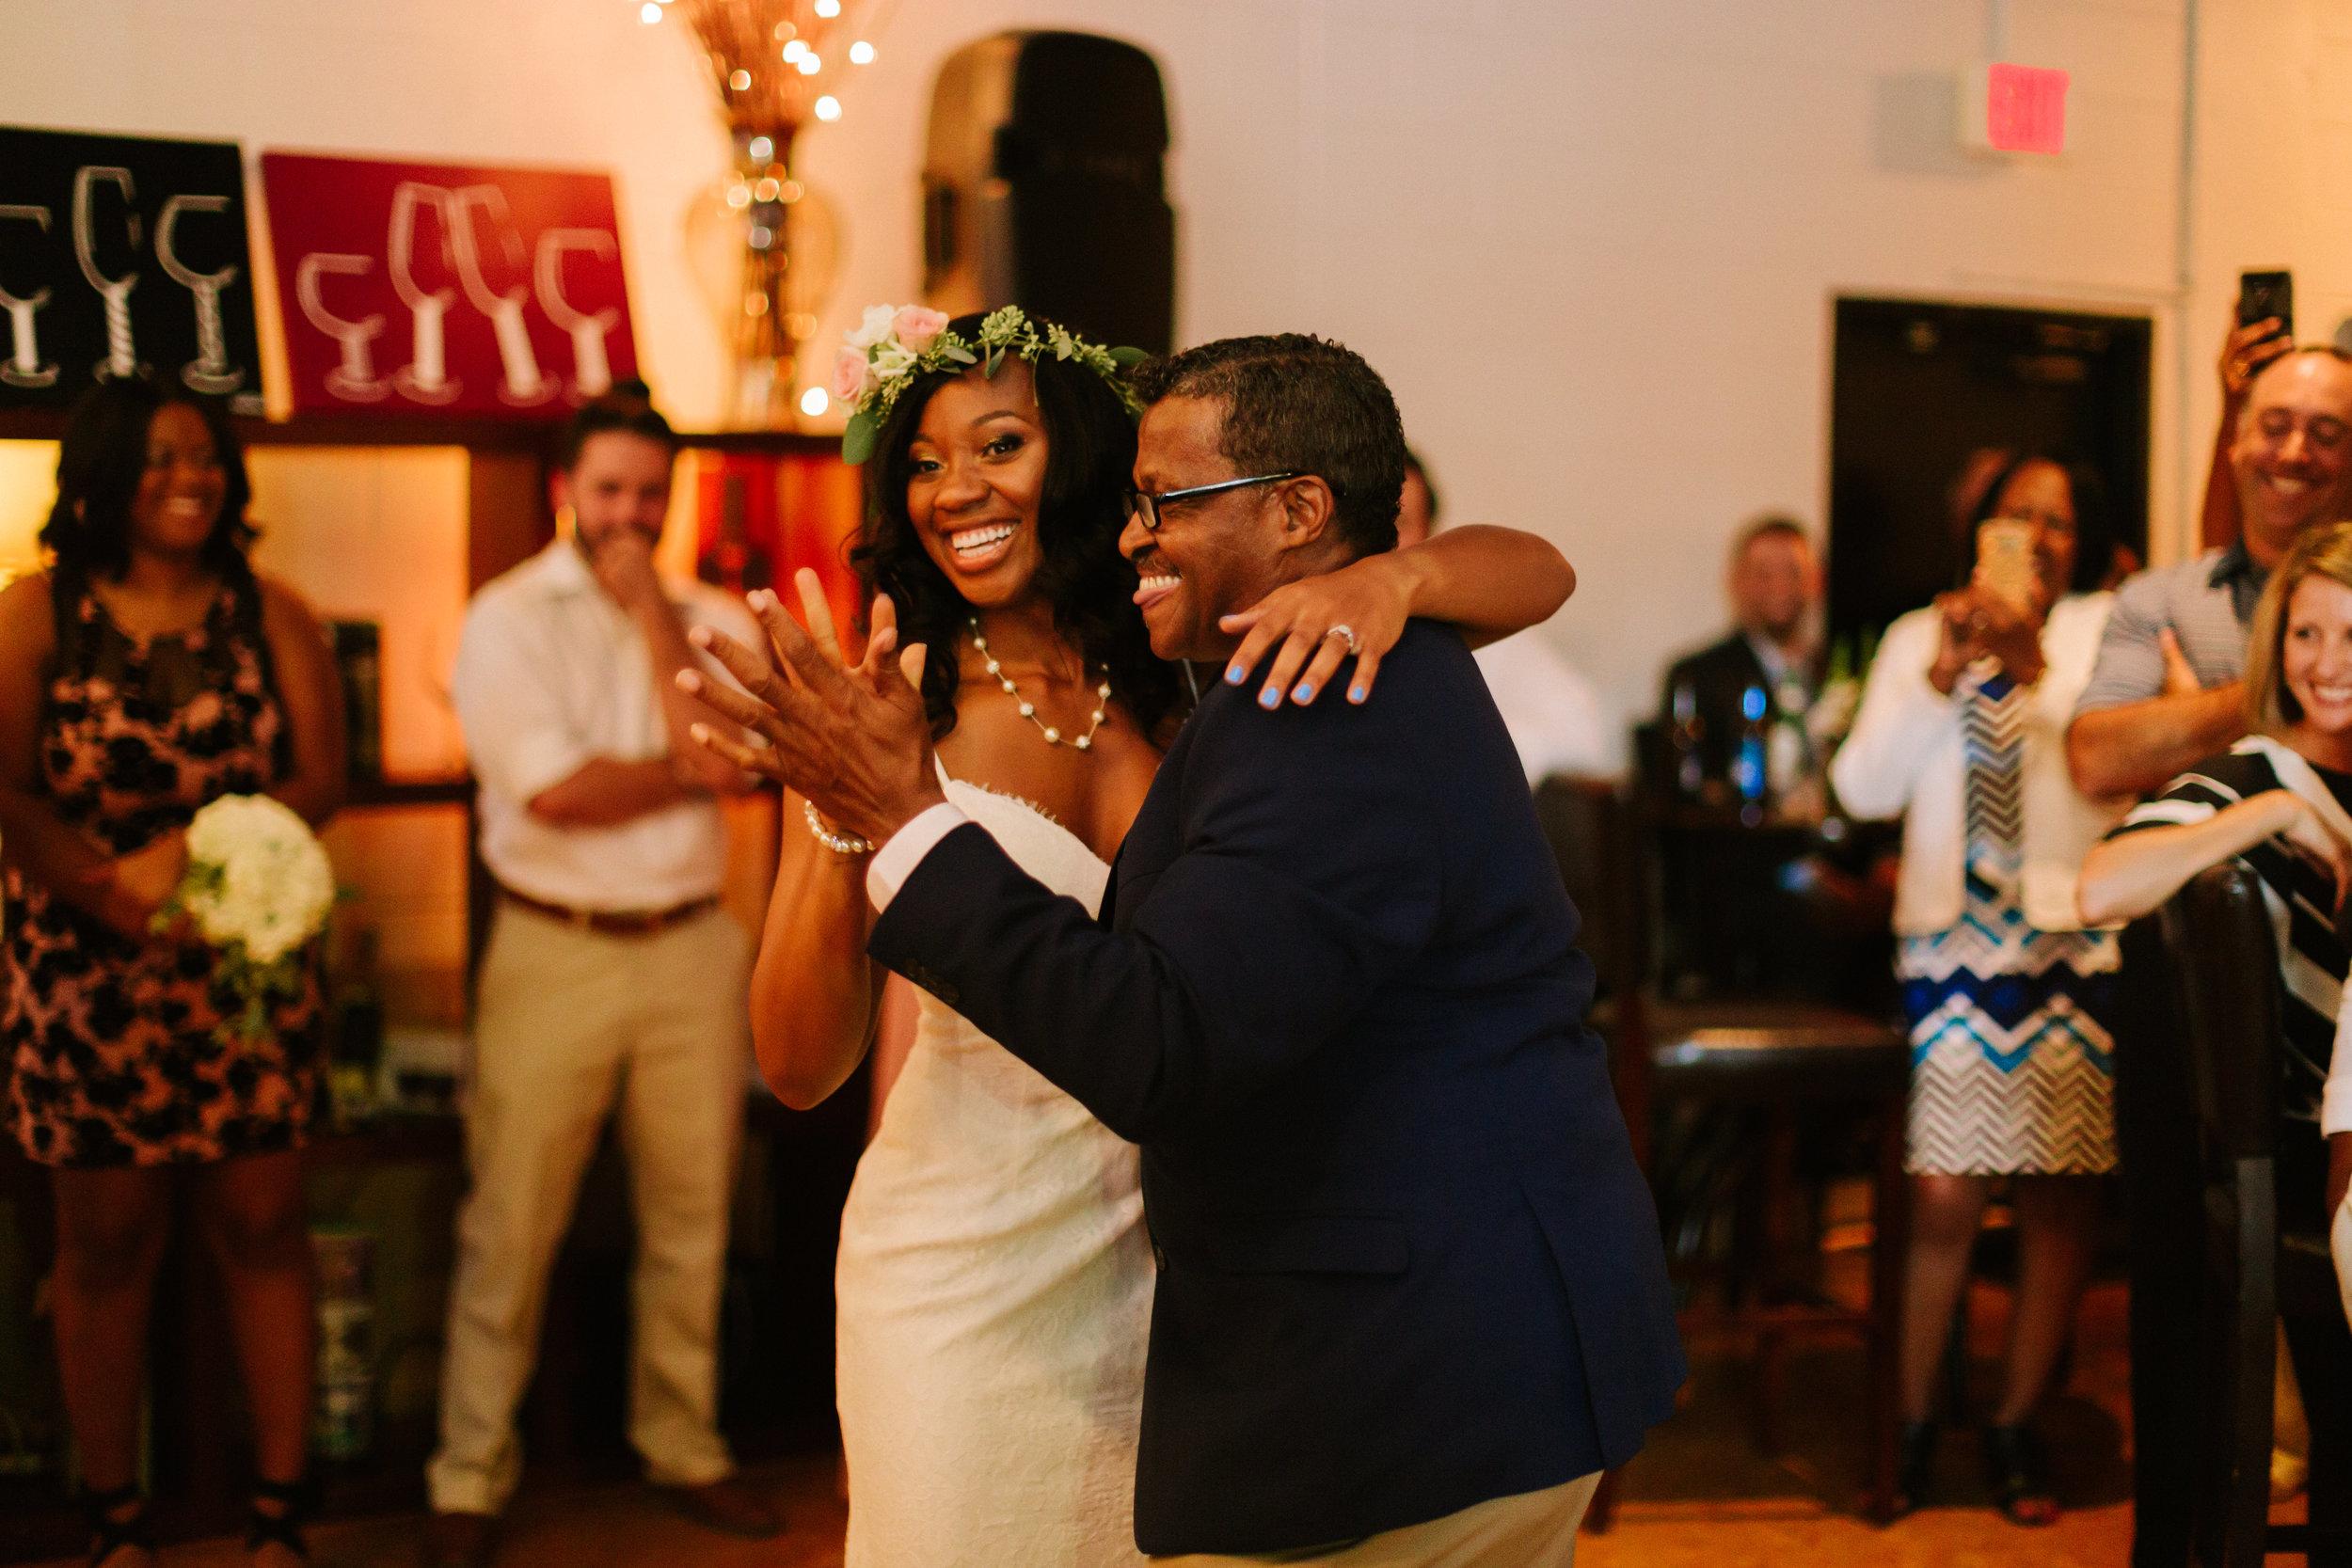 2017.09.16 Ashley and Chuck O'Day Quantam Leap Winery Wedding (331 of 462).jpg